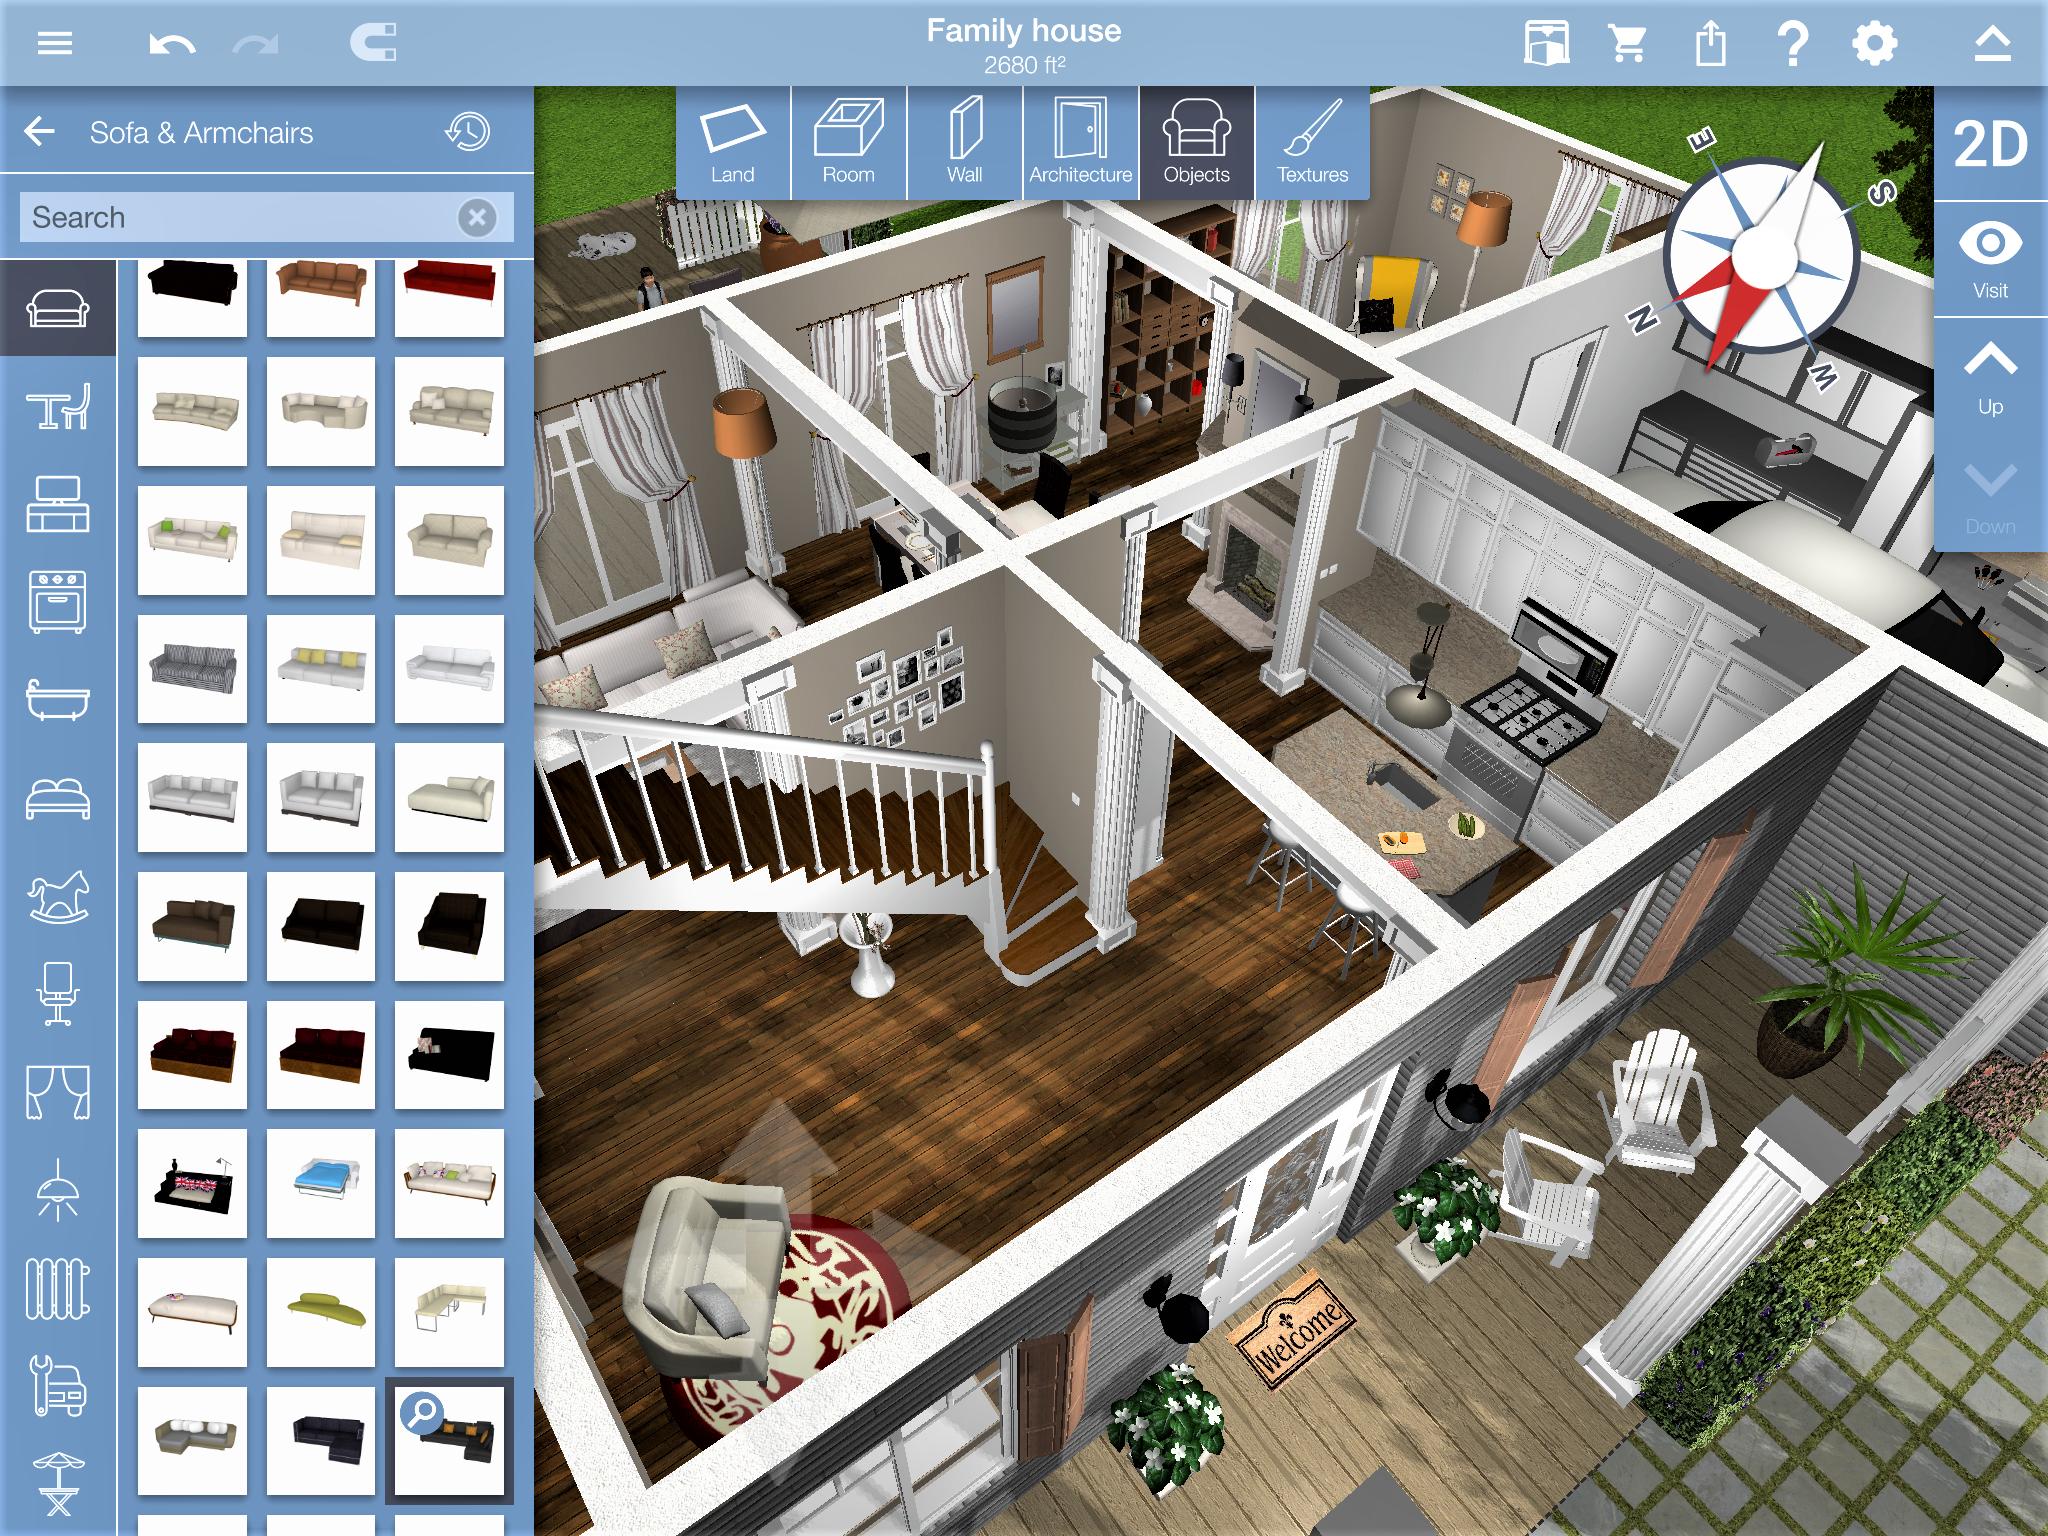 10 Home Design Apps That Ll Make You Feel Like An Interior Designer Design Your Own Home Design Home App Interior Design Apps